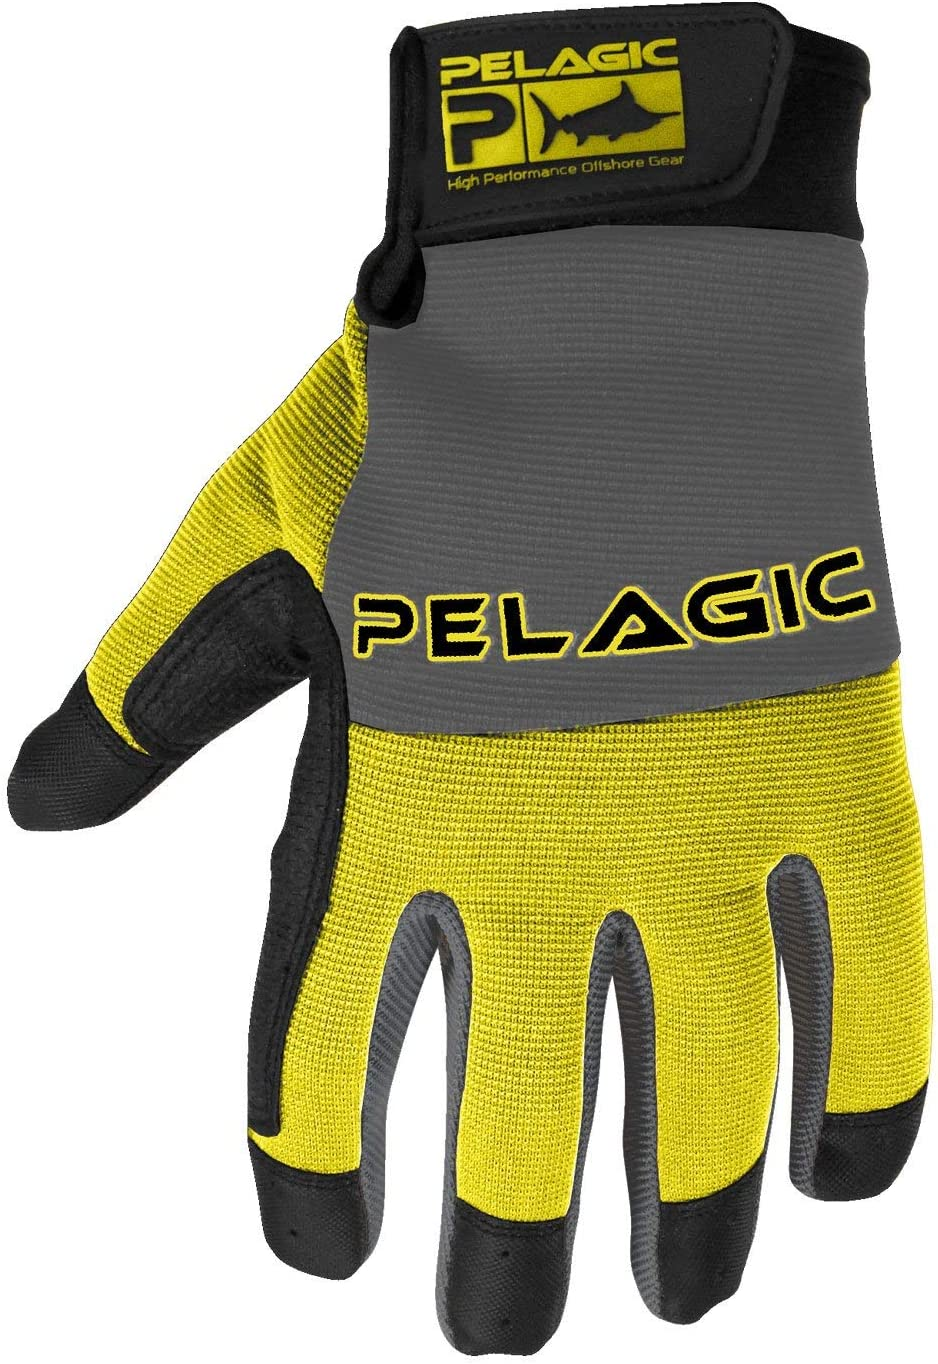 End 希望者のみラッピング無料 定価の67%OFF Game Gloves